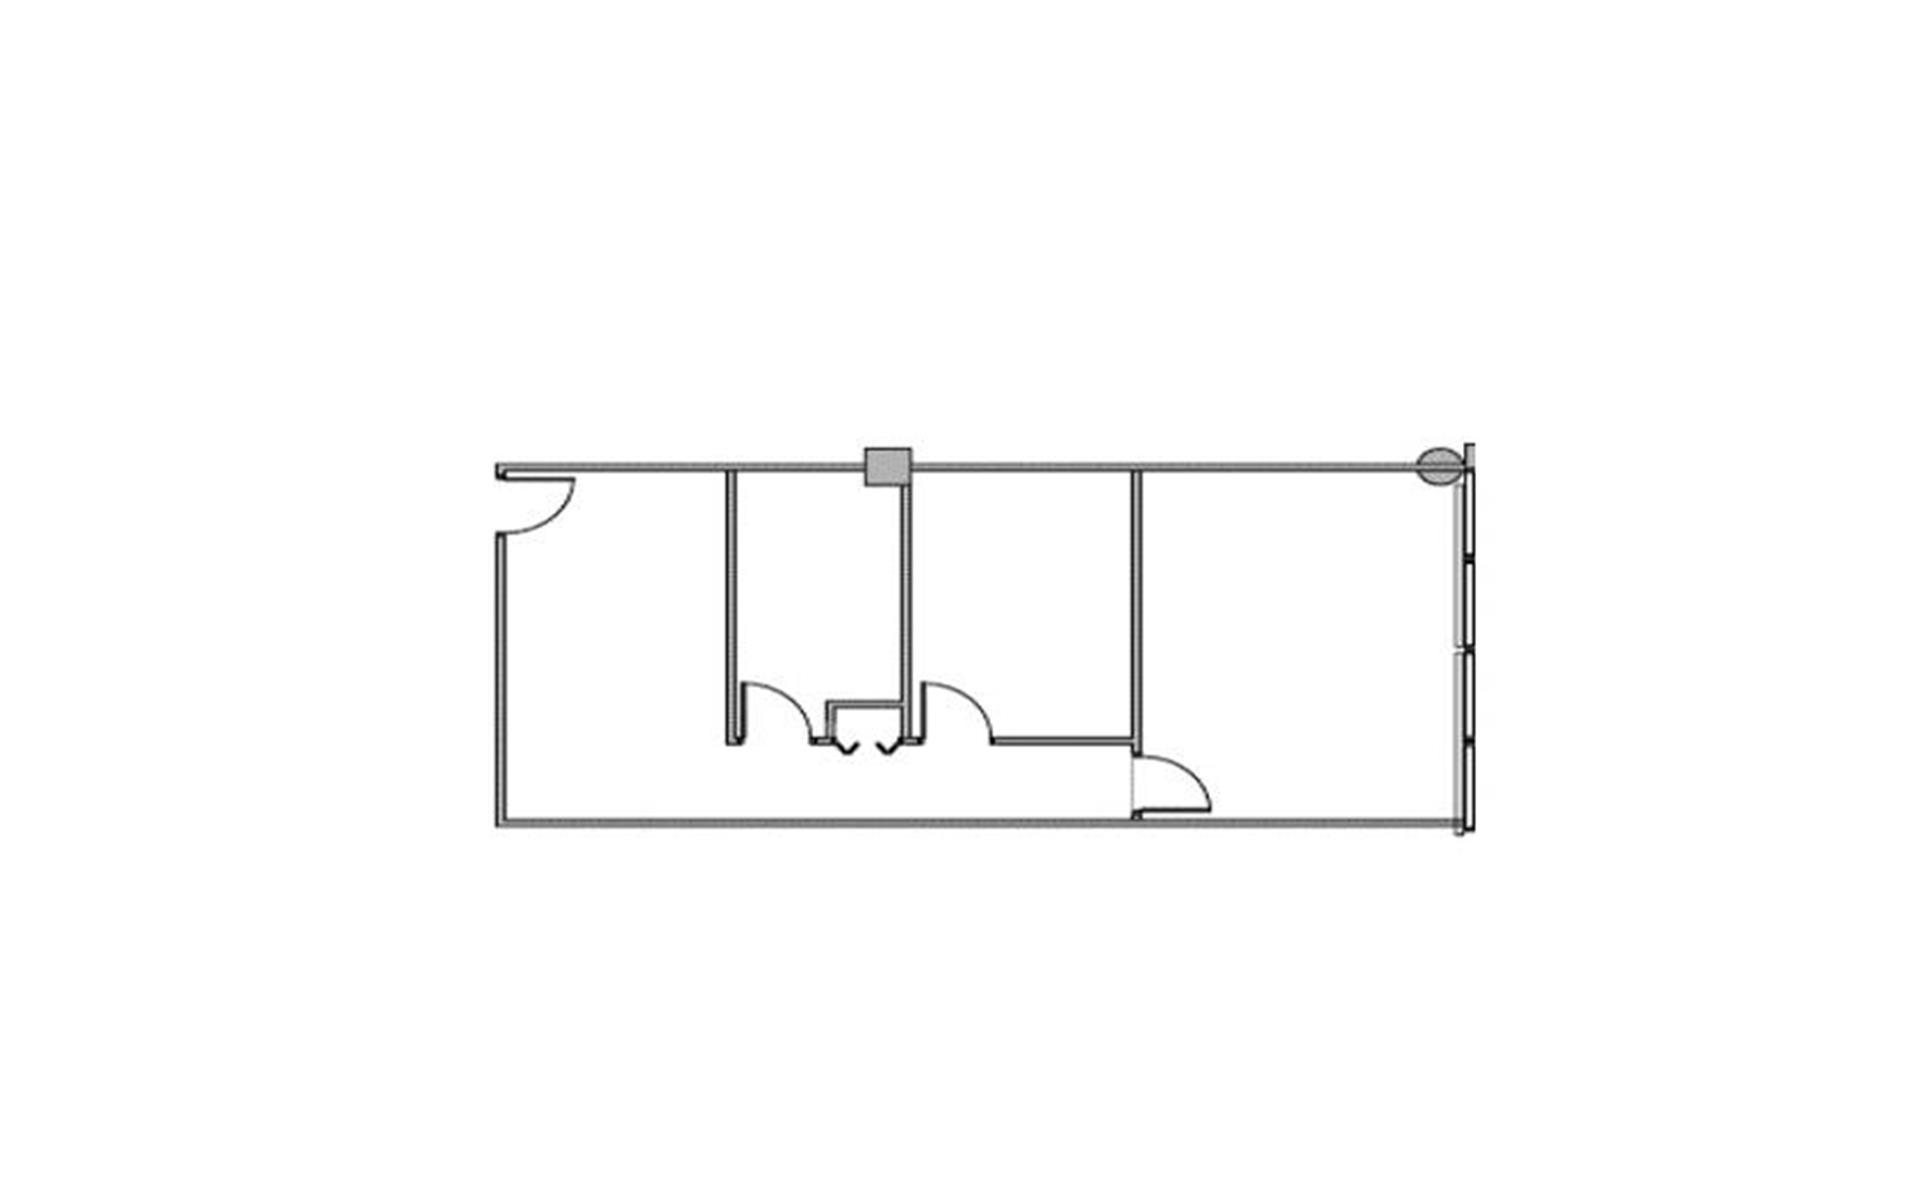 Boxer - One Century Centre - Team Space | Suite 324